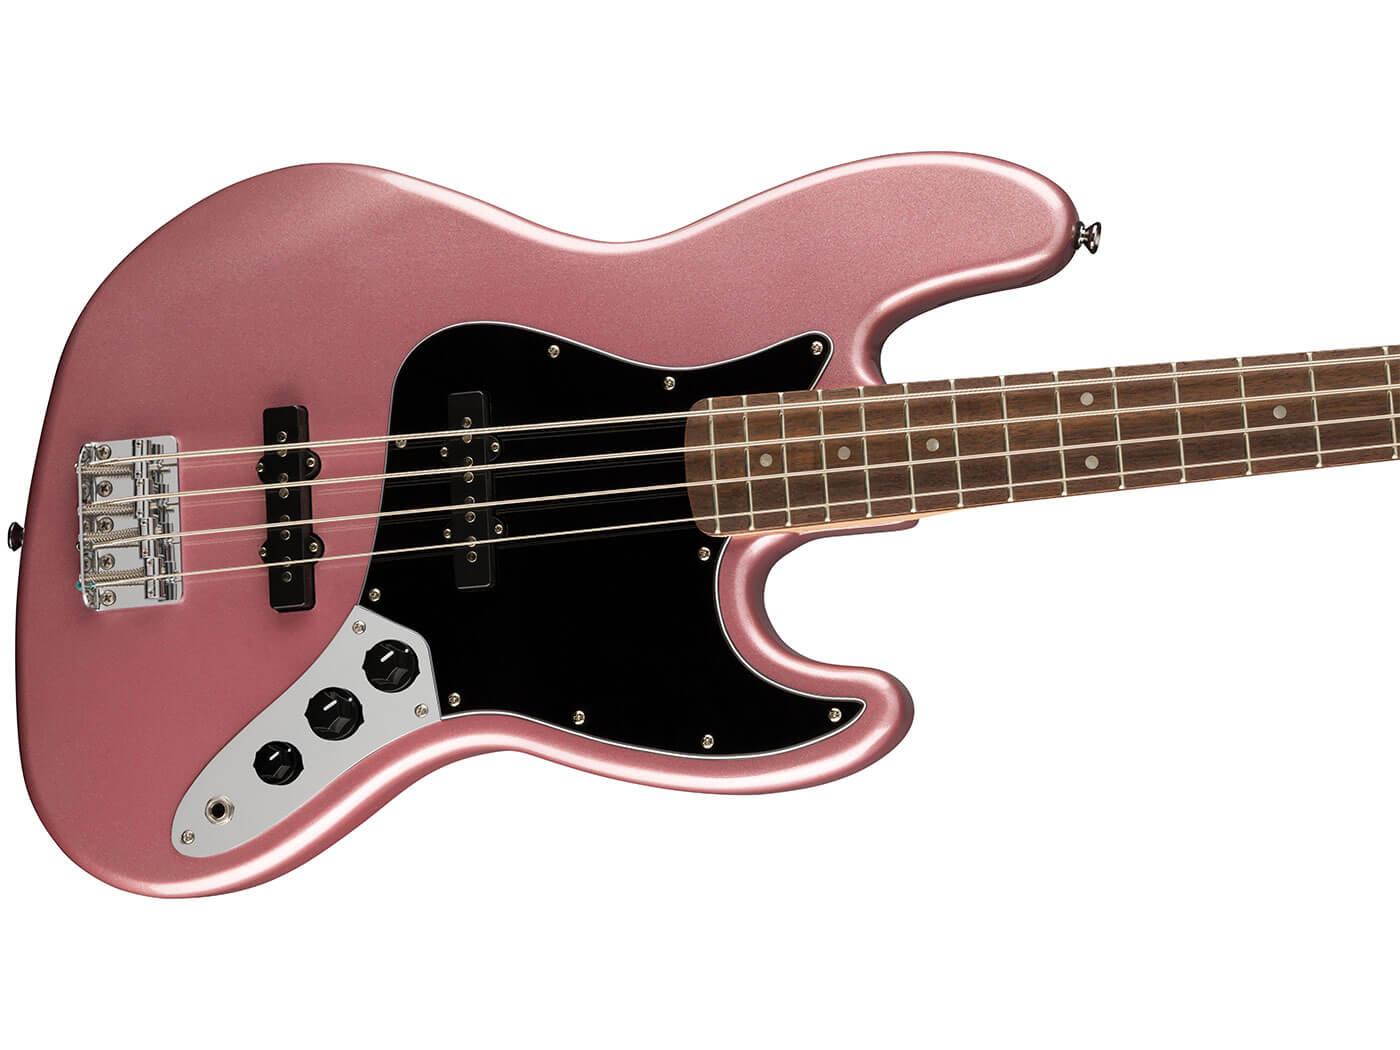 The Affinity Jazz Bass